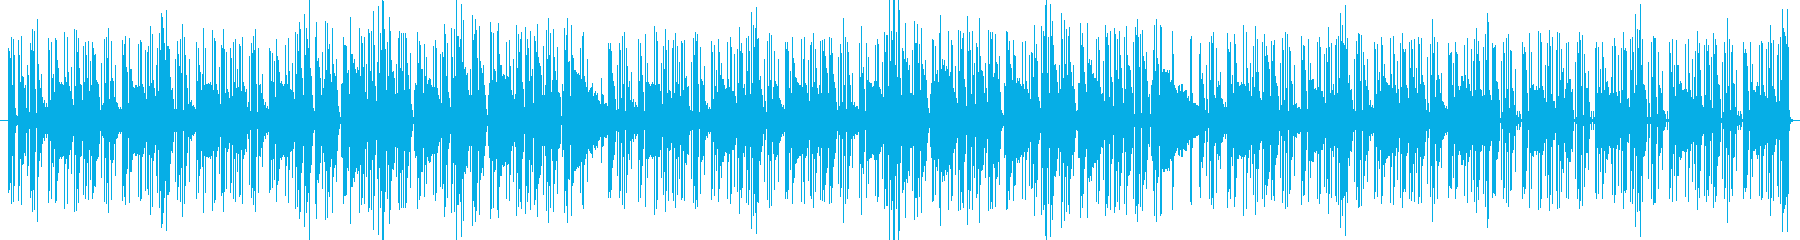 JIINO / 爽やかSOULDISCOの再生済みの波形